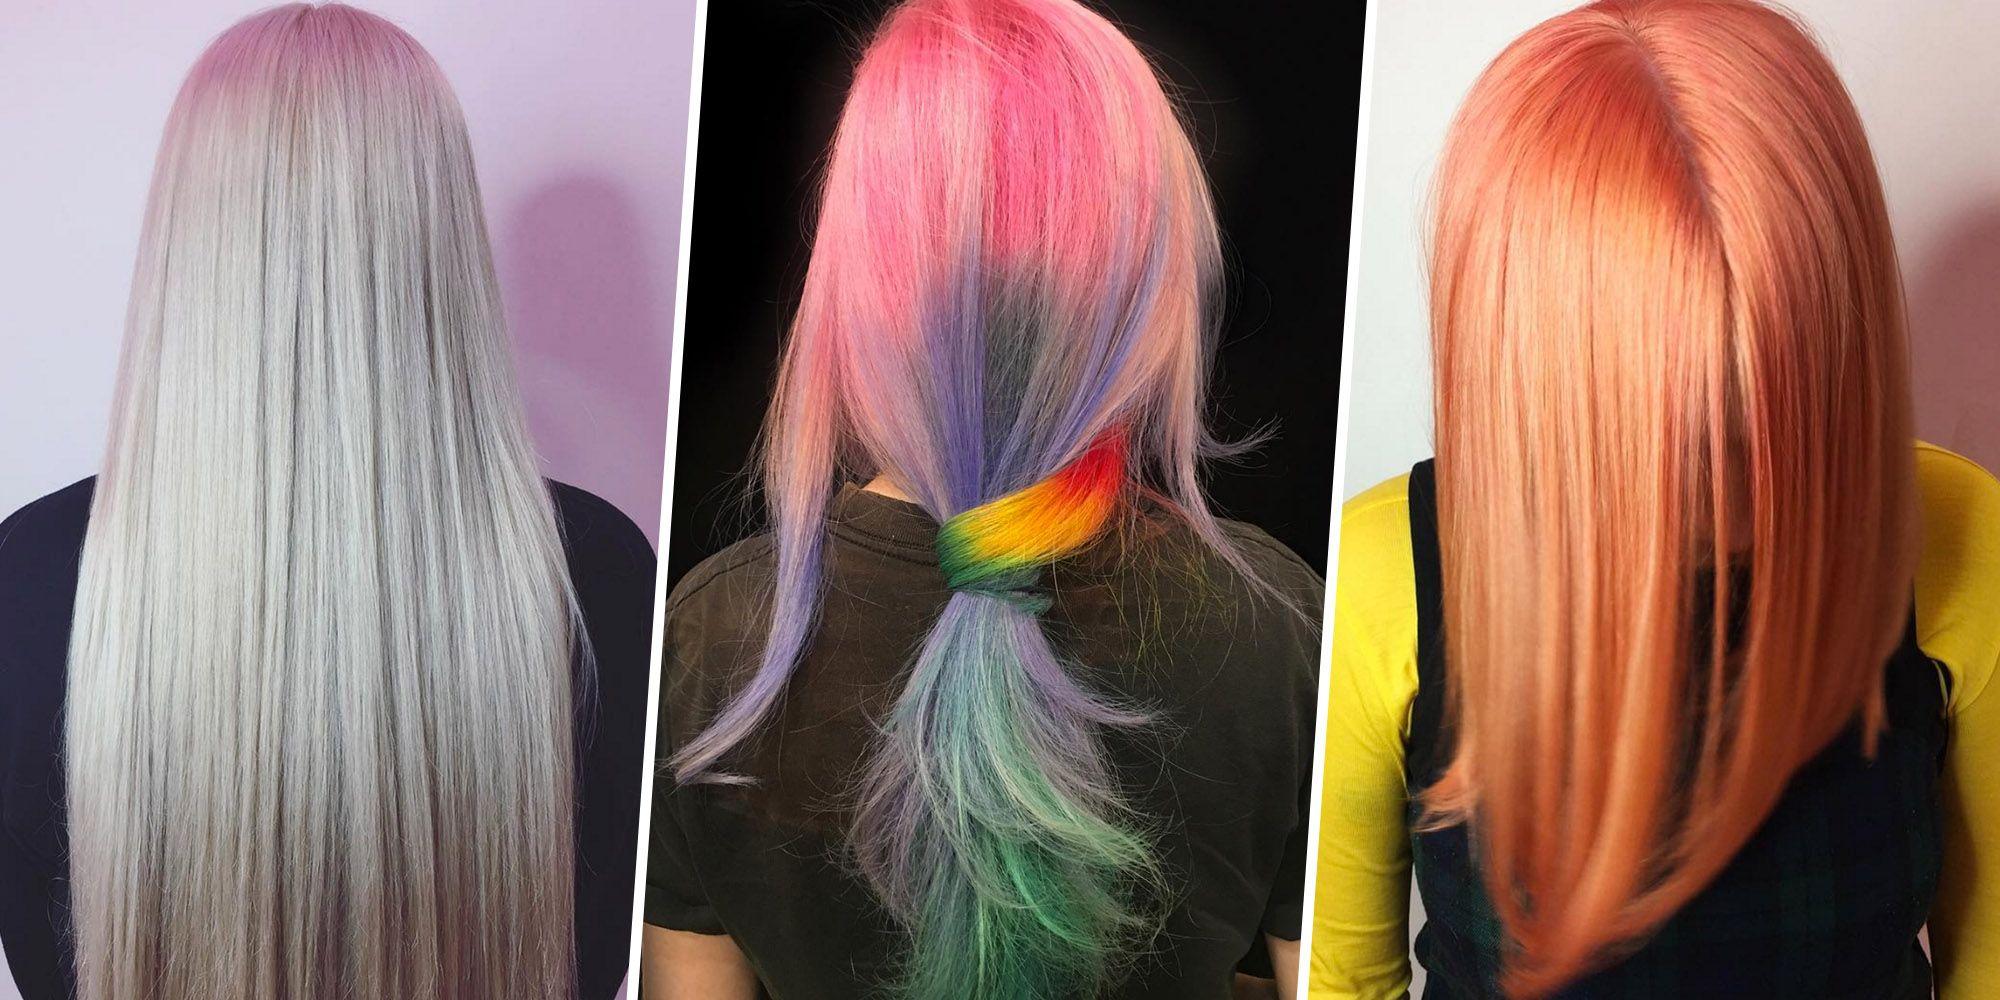 「hair color」的圖片搜尋結果